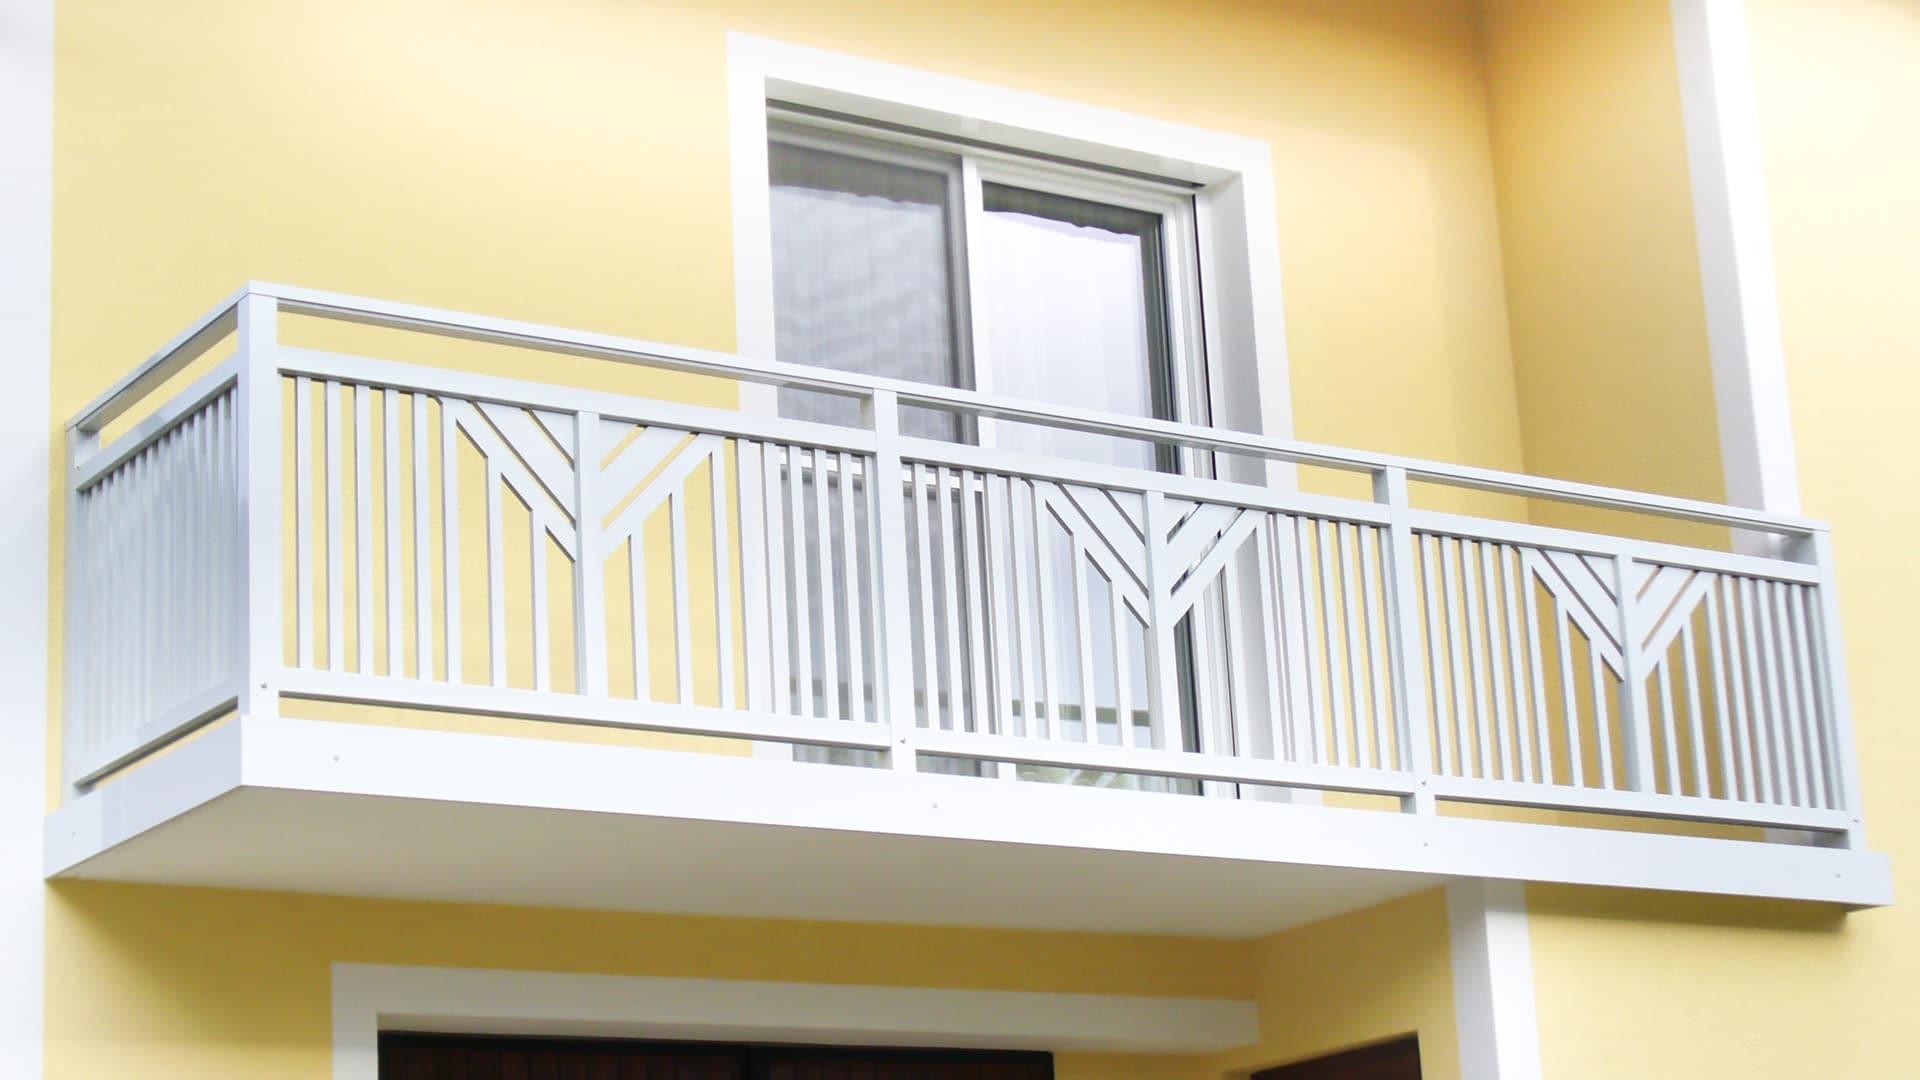 Perchtoldsdorf 01 a | Balkon grau, senkrechte Aluminium Sprossen, diagonalen Latten mittig | Svoboda